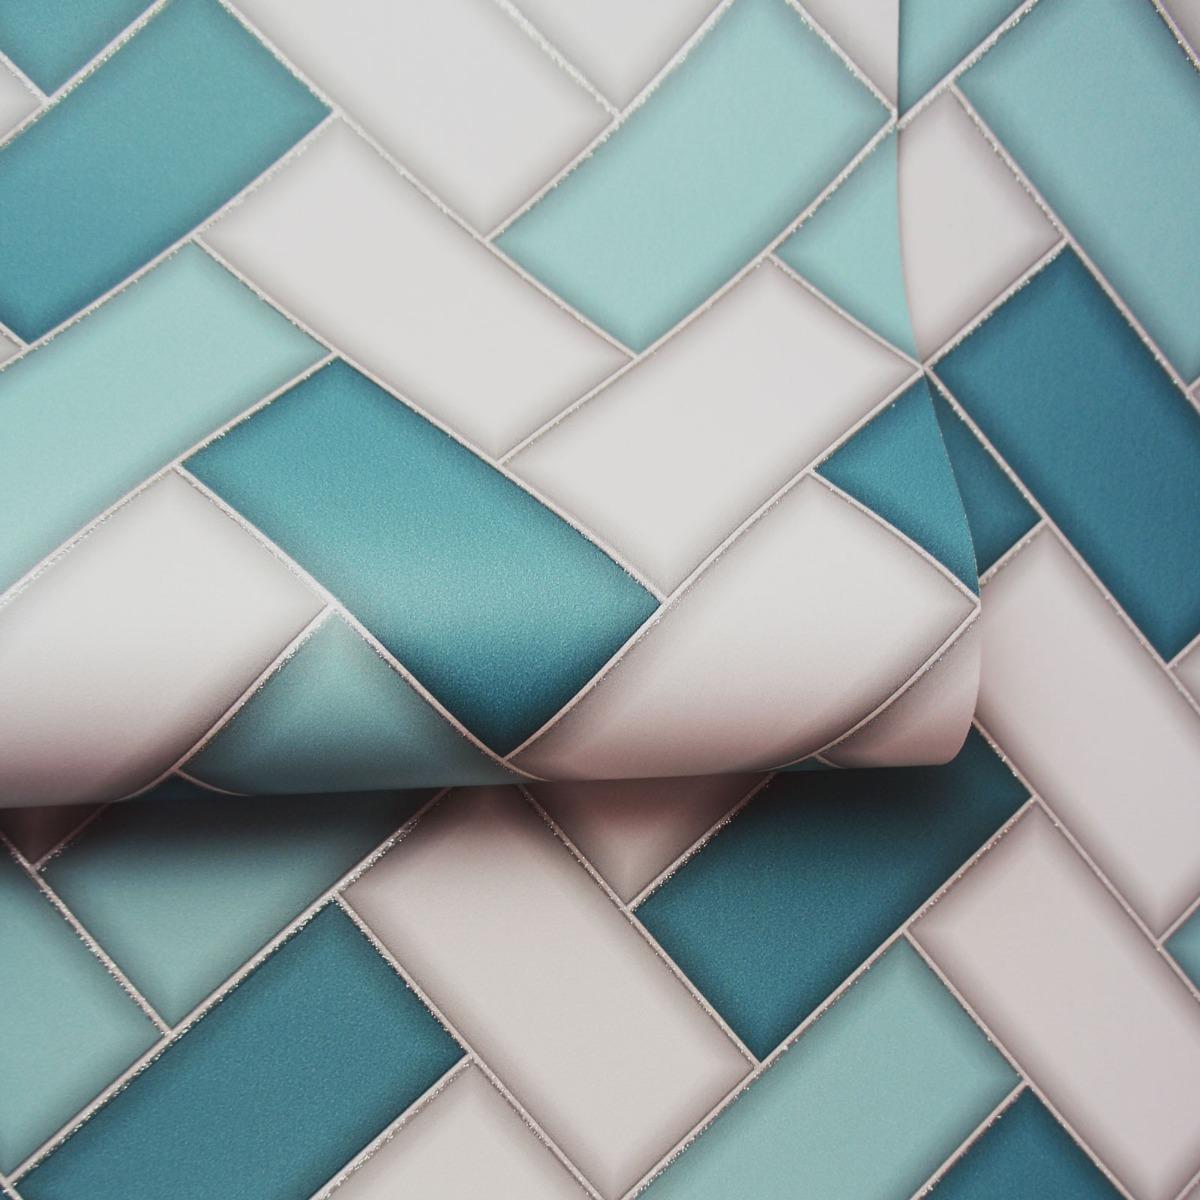 Tiling on a Roll Chevron Tile Wallpaper - Teal Holden 89301